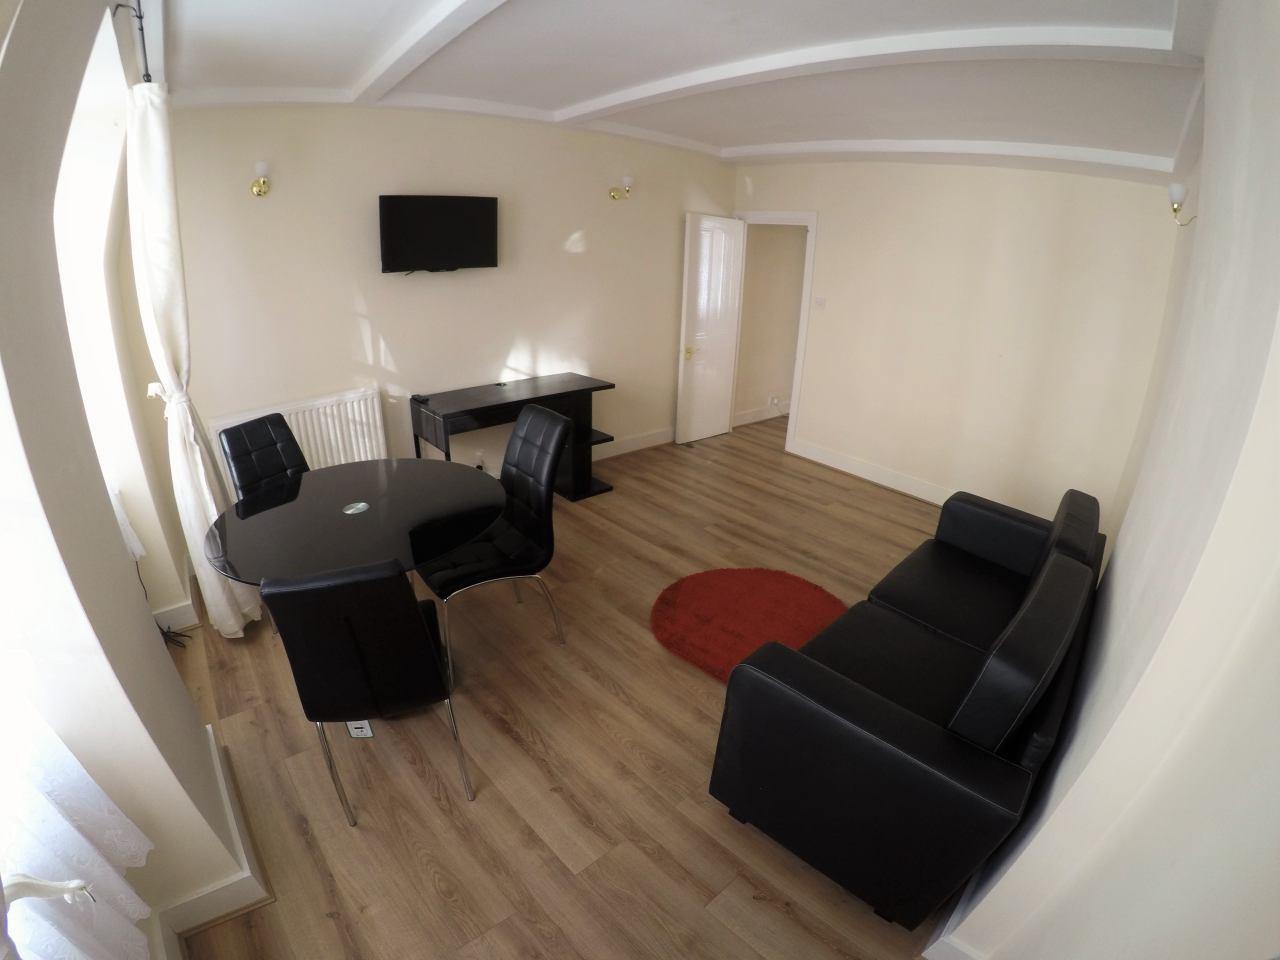 accommodation-10-mins-ucl-23b347f4adf080de30da7fe92afe59b4